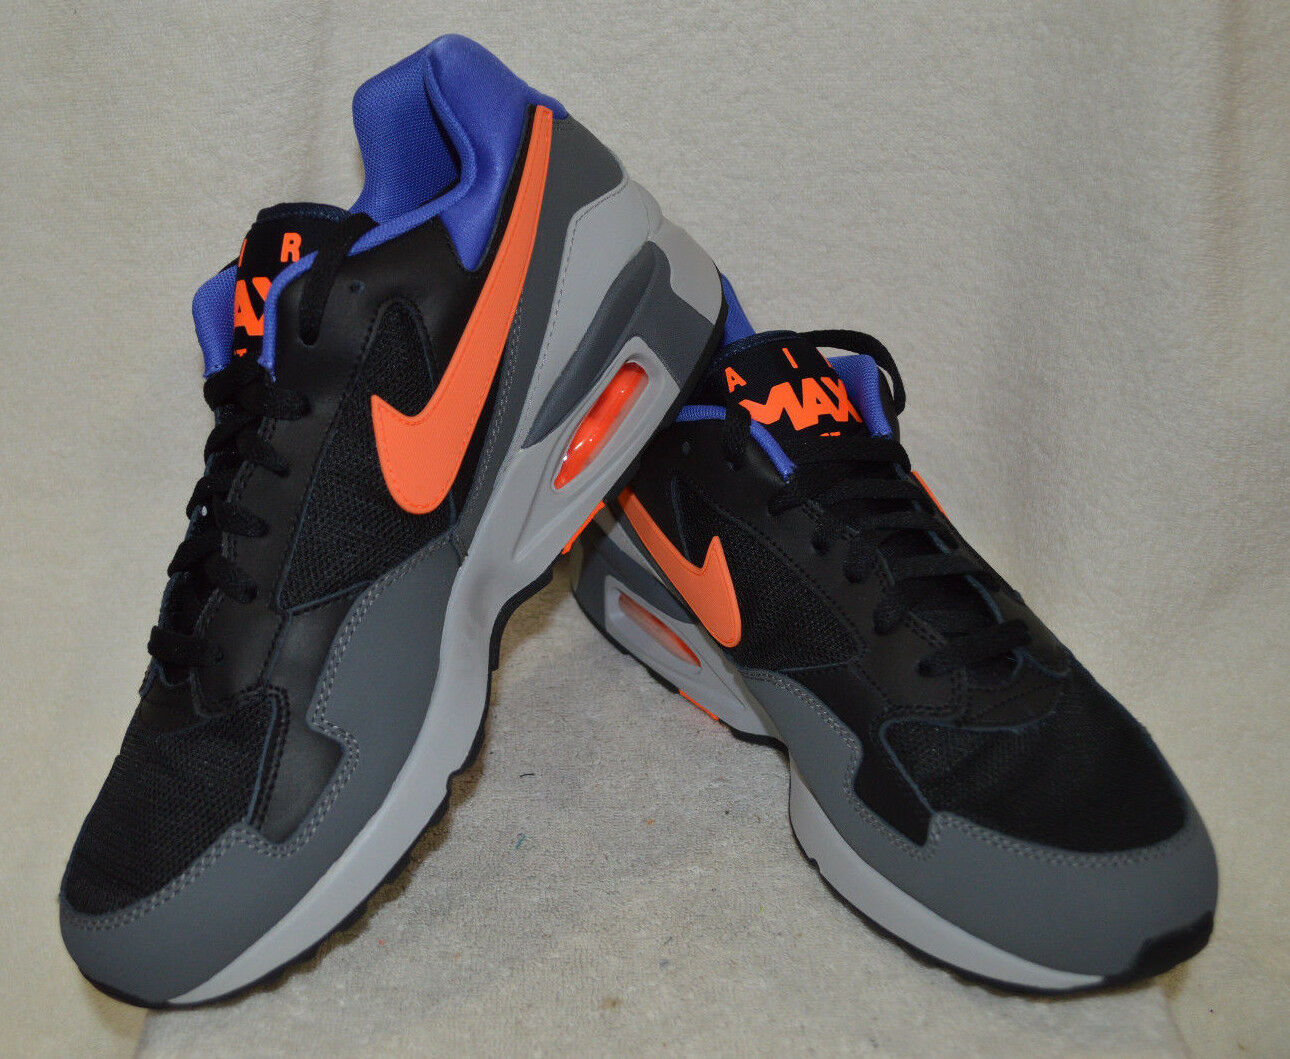 Nike air max st nero / iper - crimson / grigio scuro uomini scarpe - dimensioni nwb nero / iper - crimson / drak grey